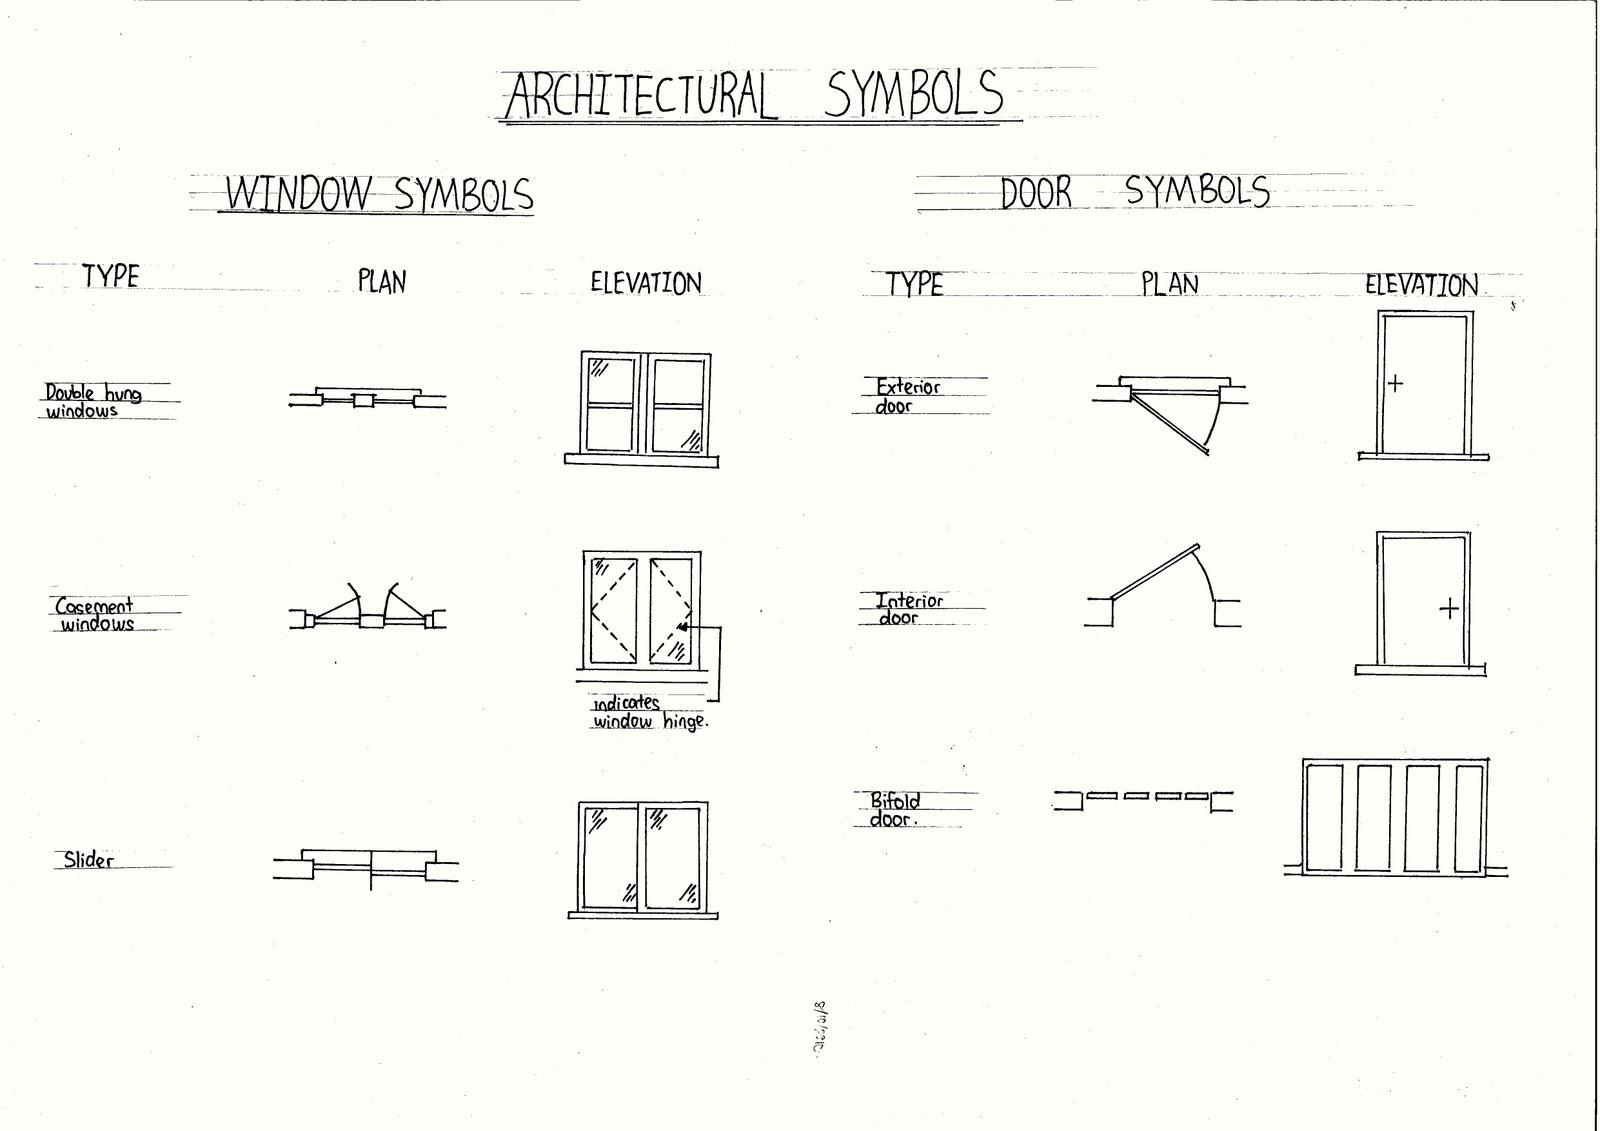 Elevation Plan Symbols : Electronic schematic symbols auto cad get free image